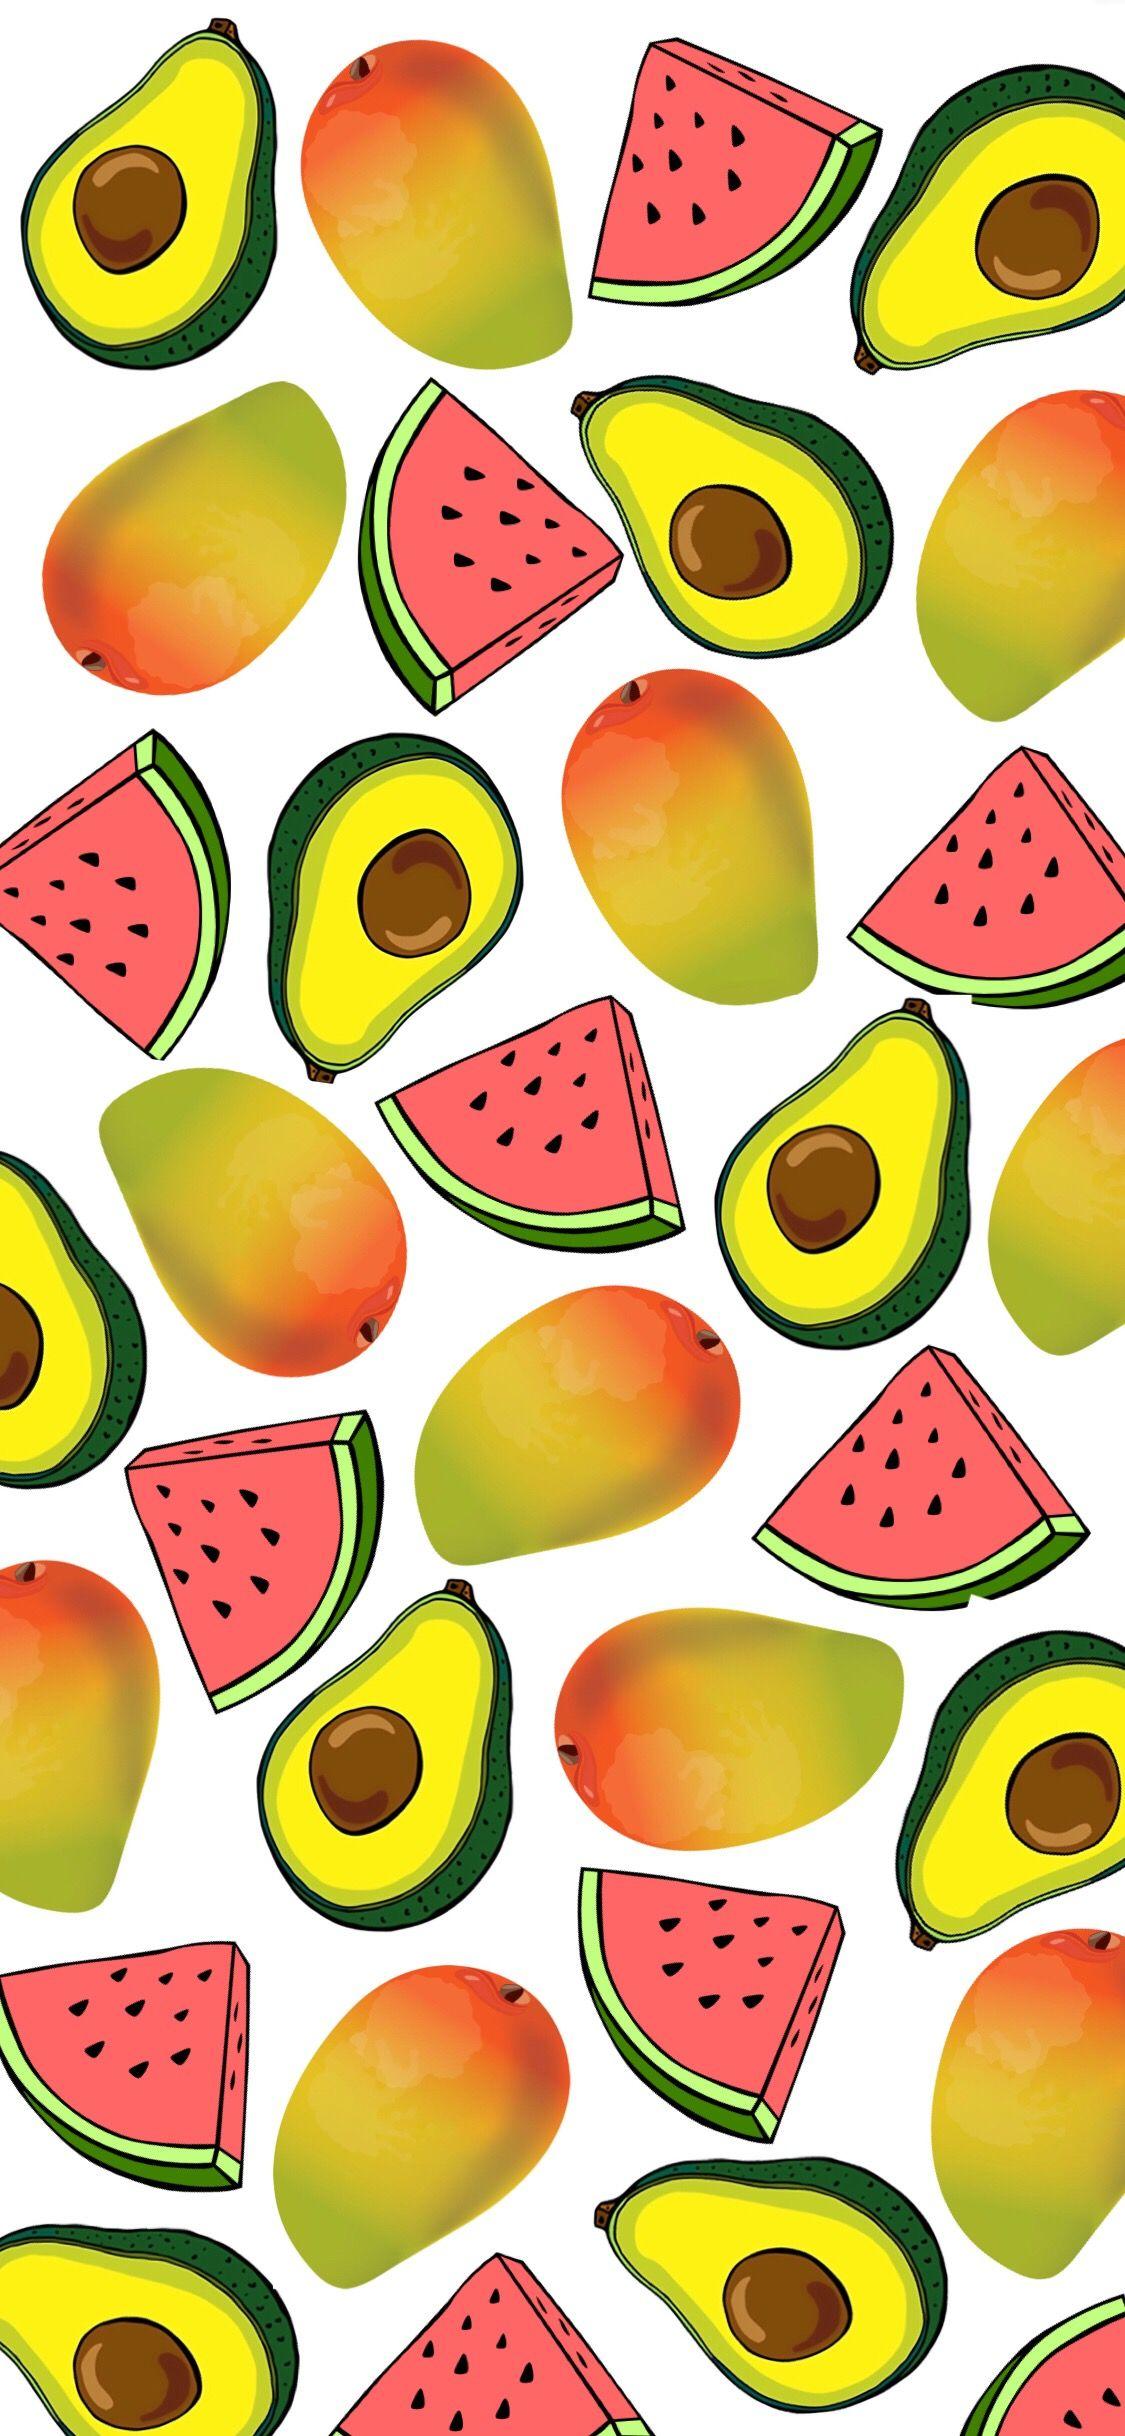 watermellon avocado mango iphone wallpaper